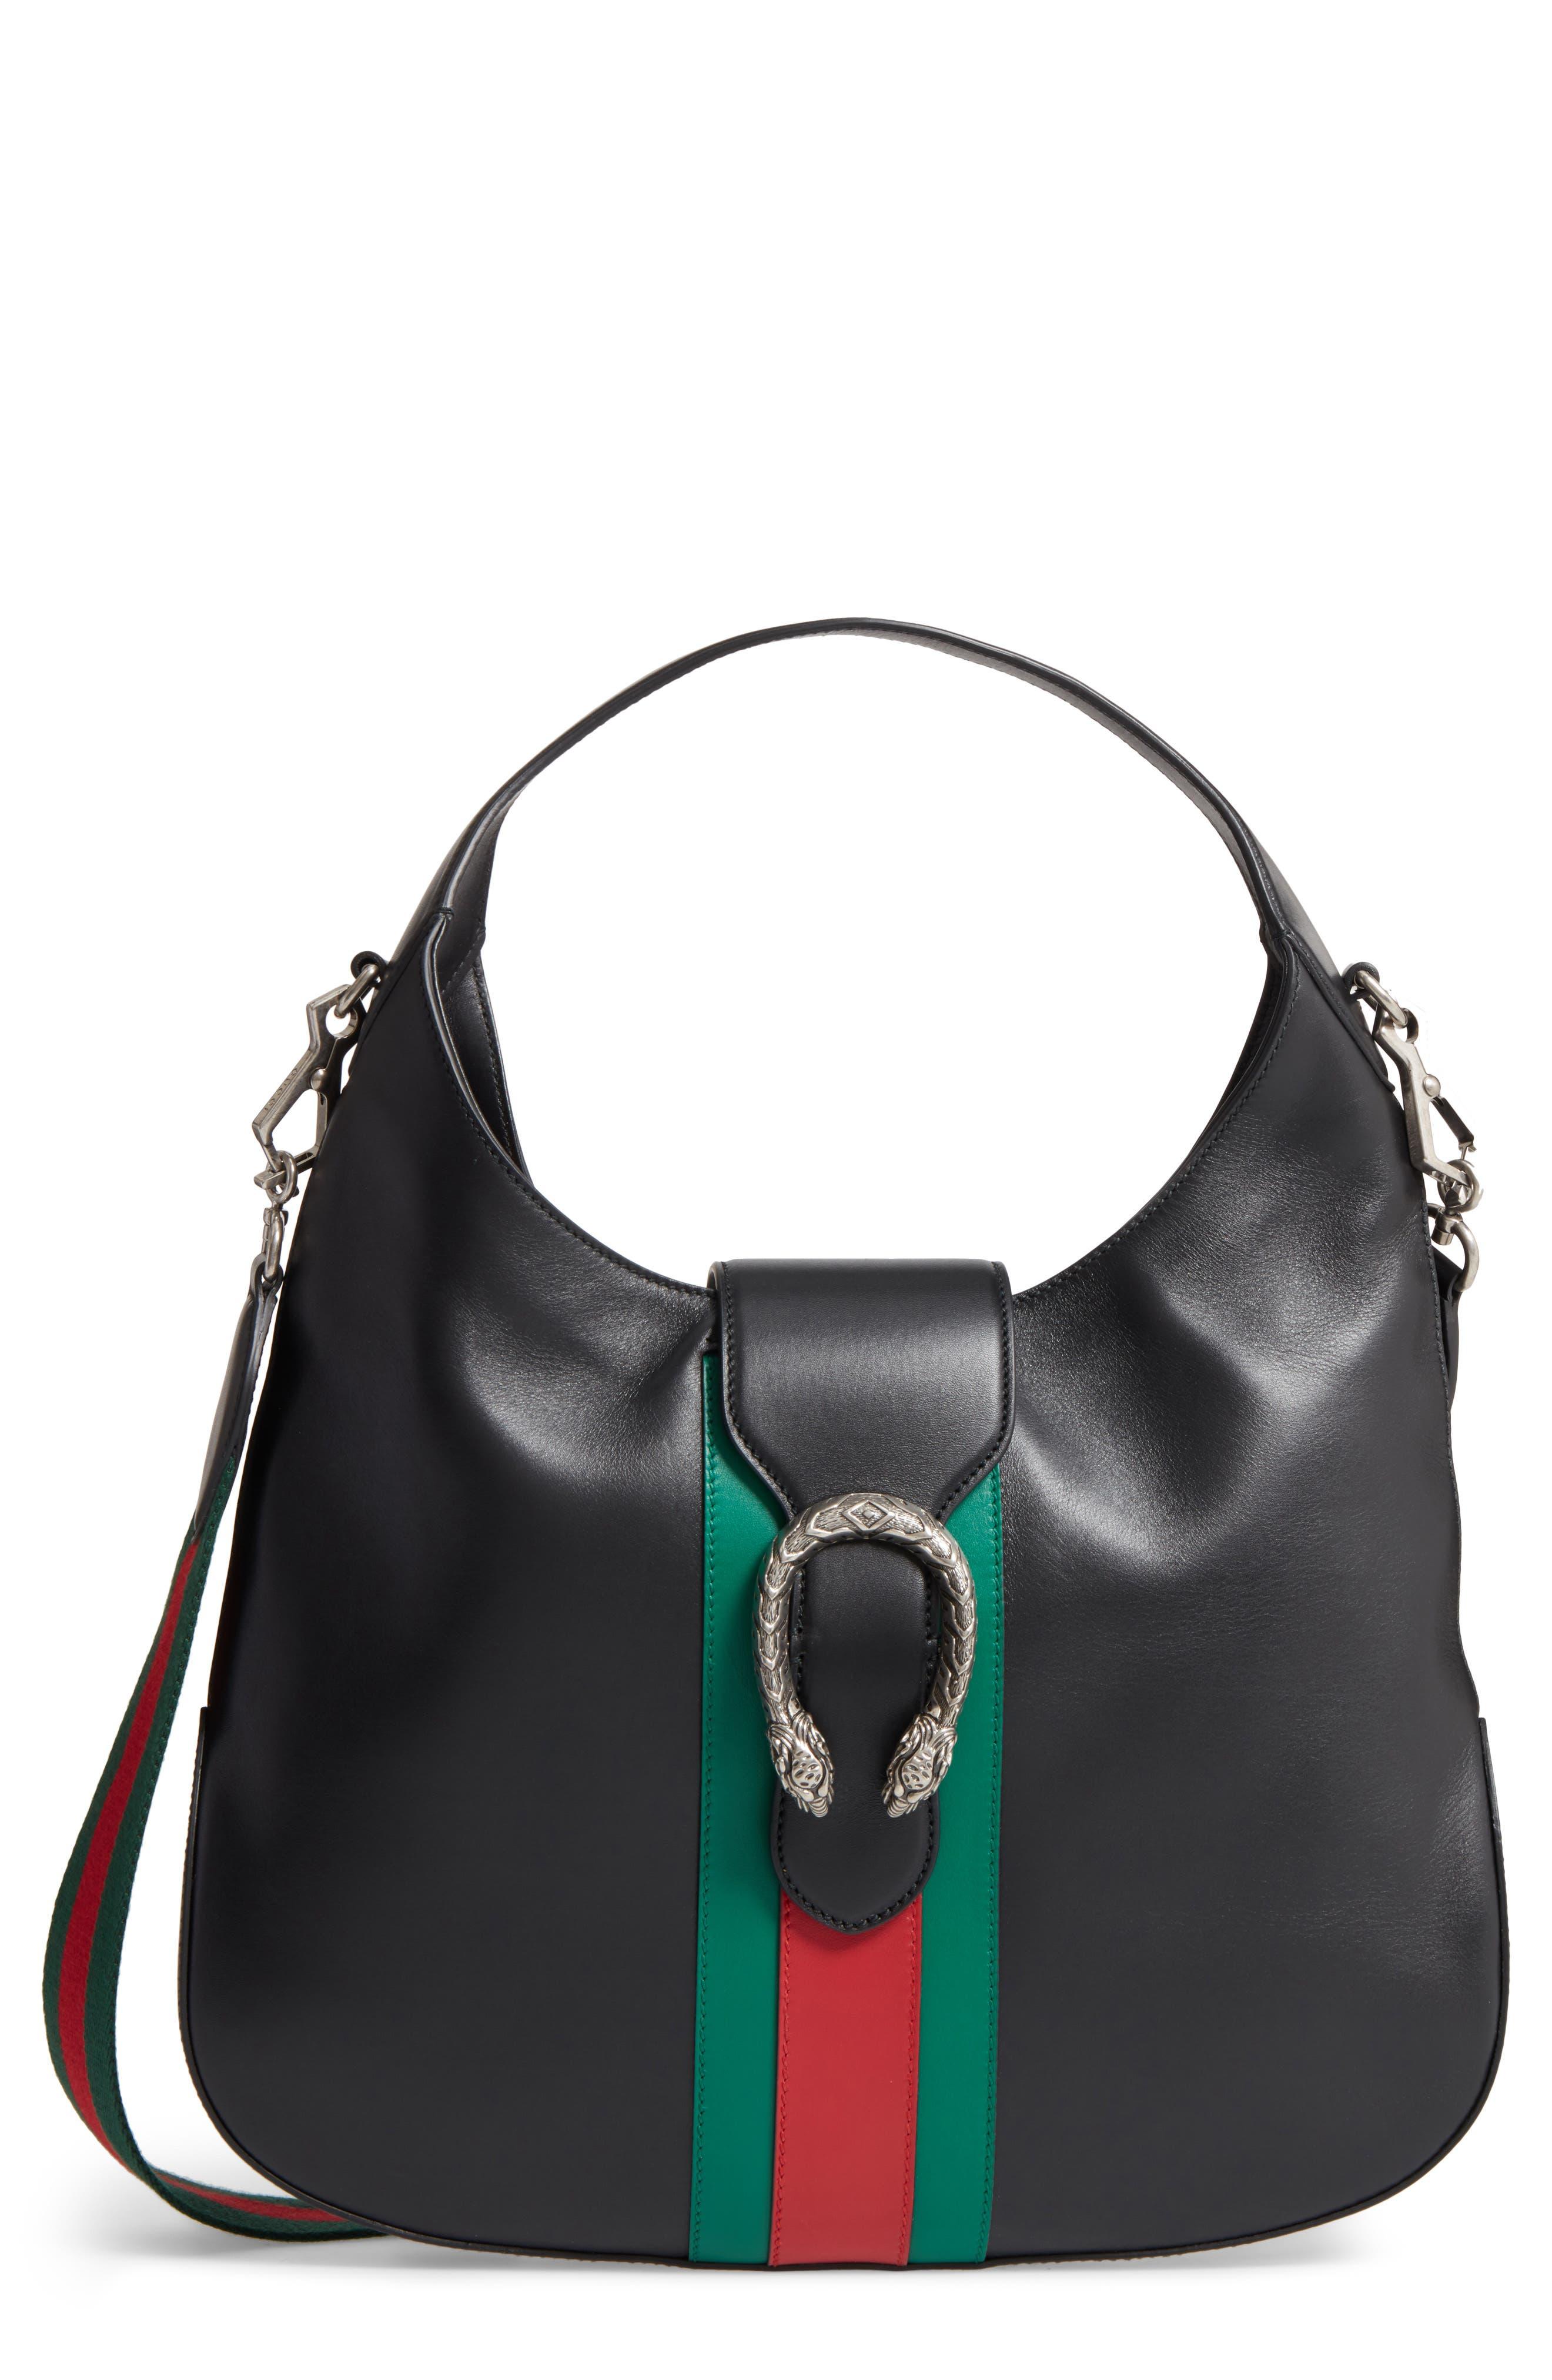 Gucci Dionysus Medium Leather Hobo Bag